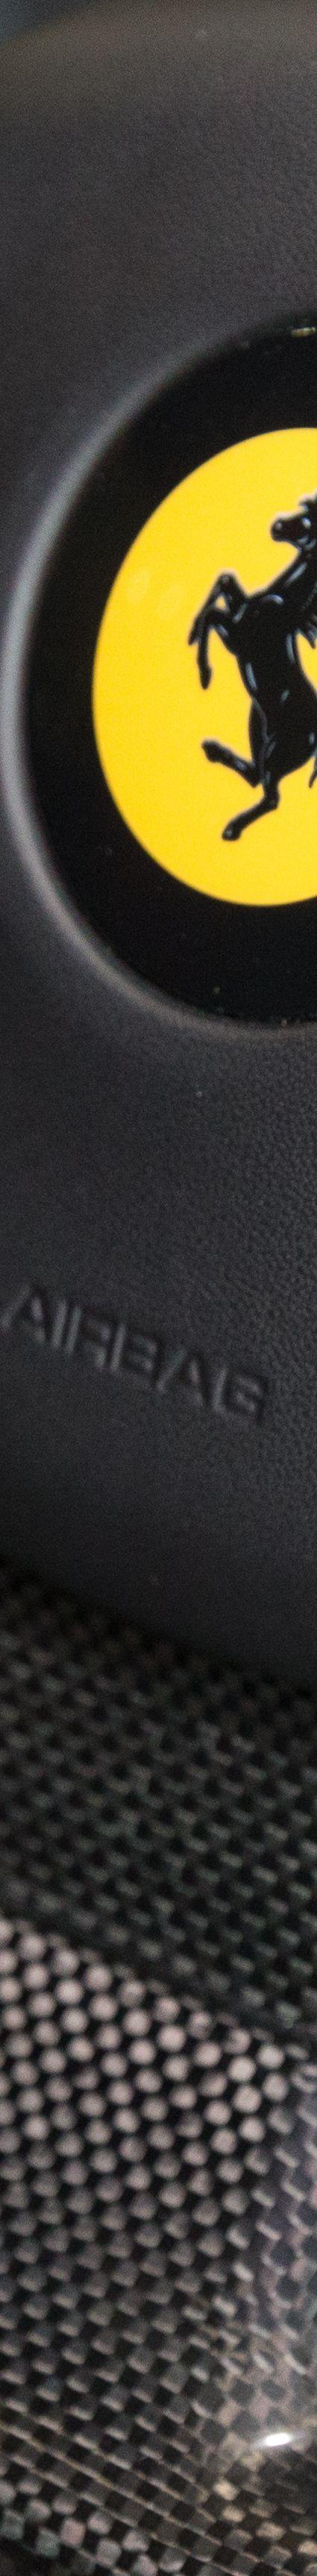 2011 FERRARI 458 ITALIA F142- sold in Australia